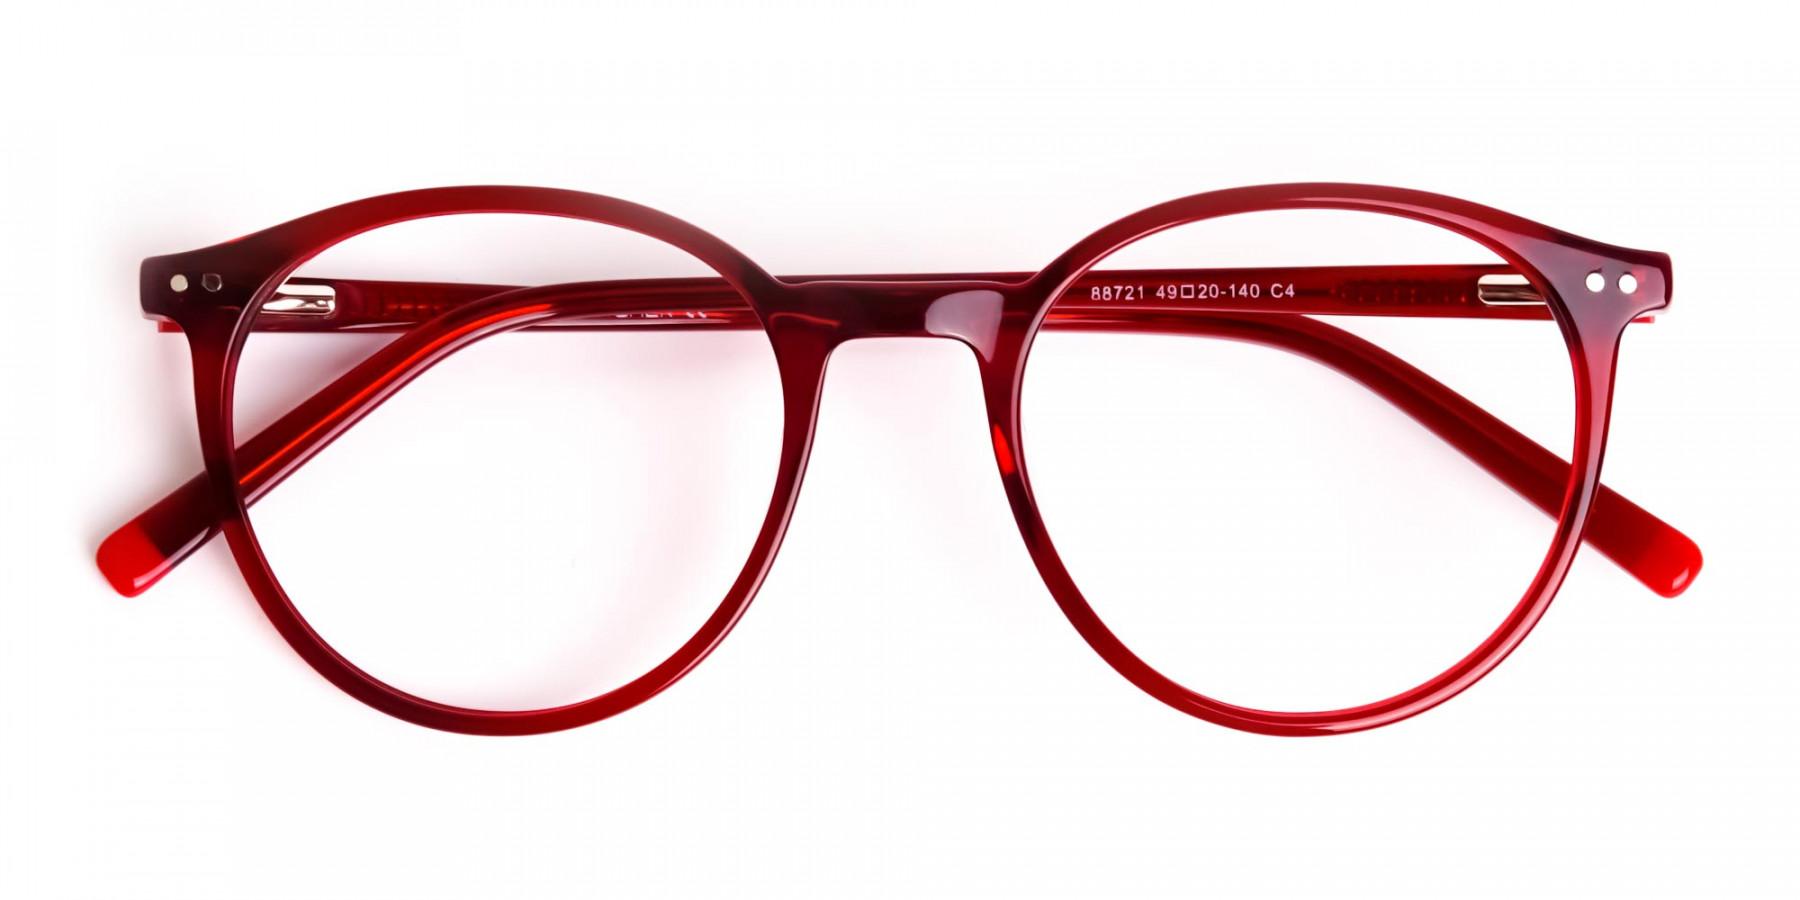 dark-and-wine-red-round-glasses-frames-1